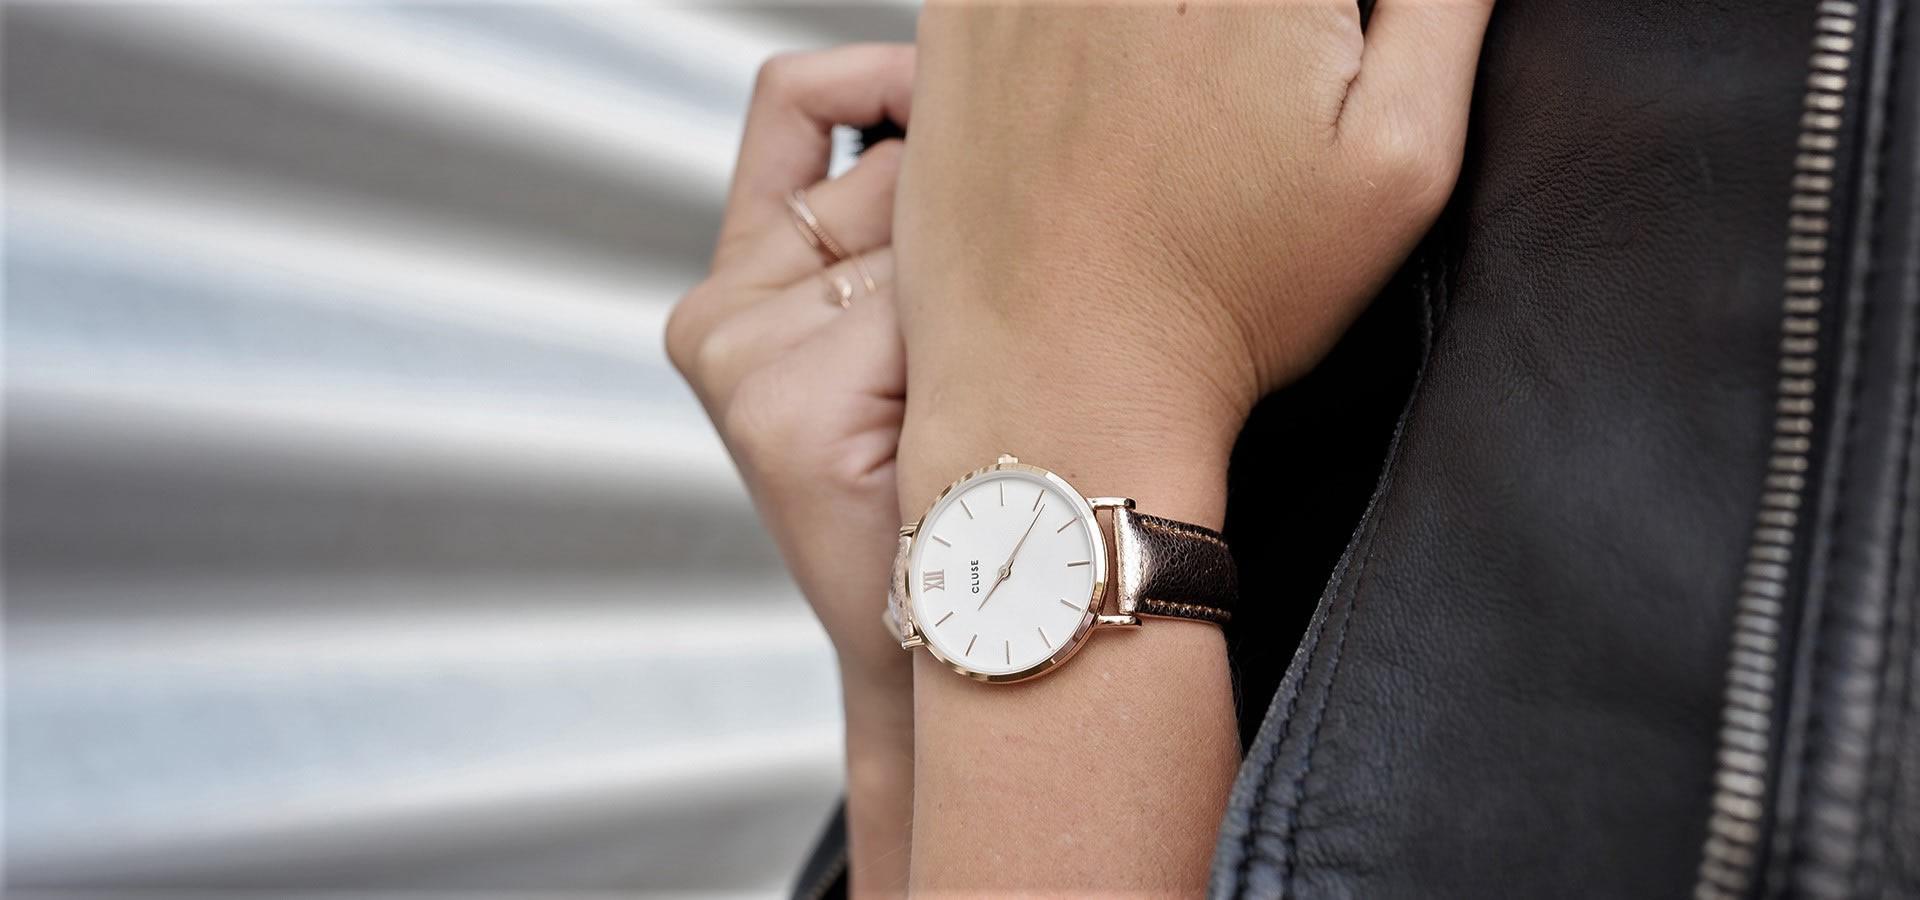 Cluse - promocja 15% na zegarki Cluse